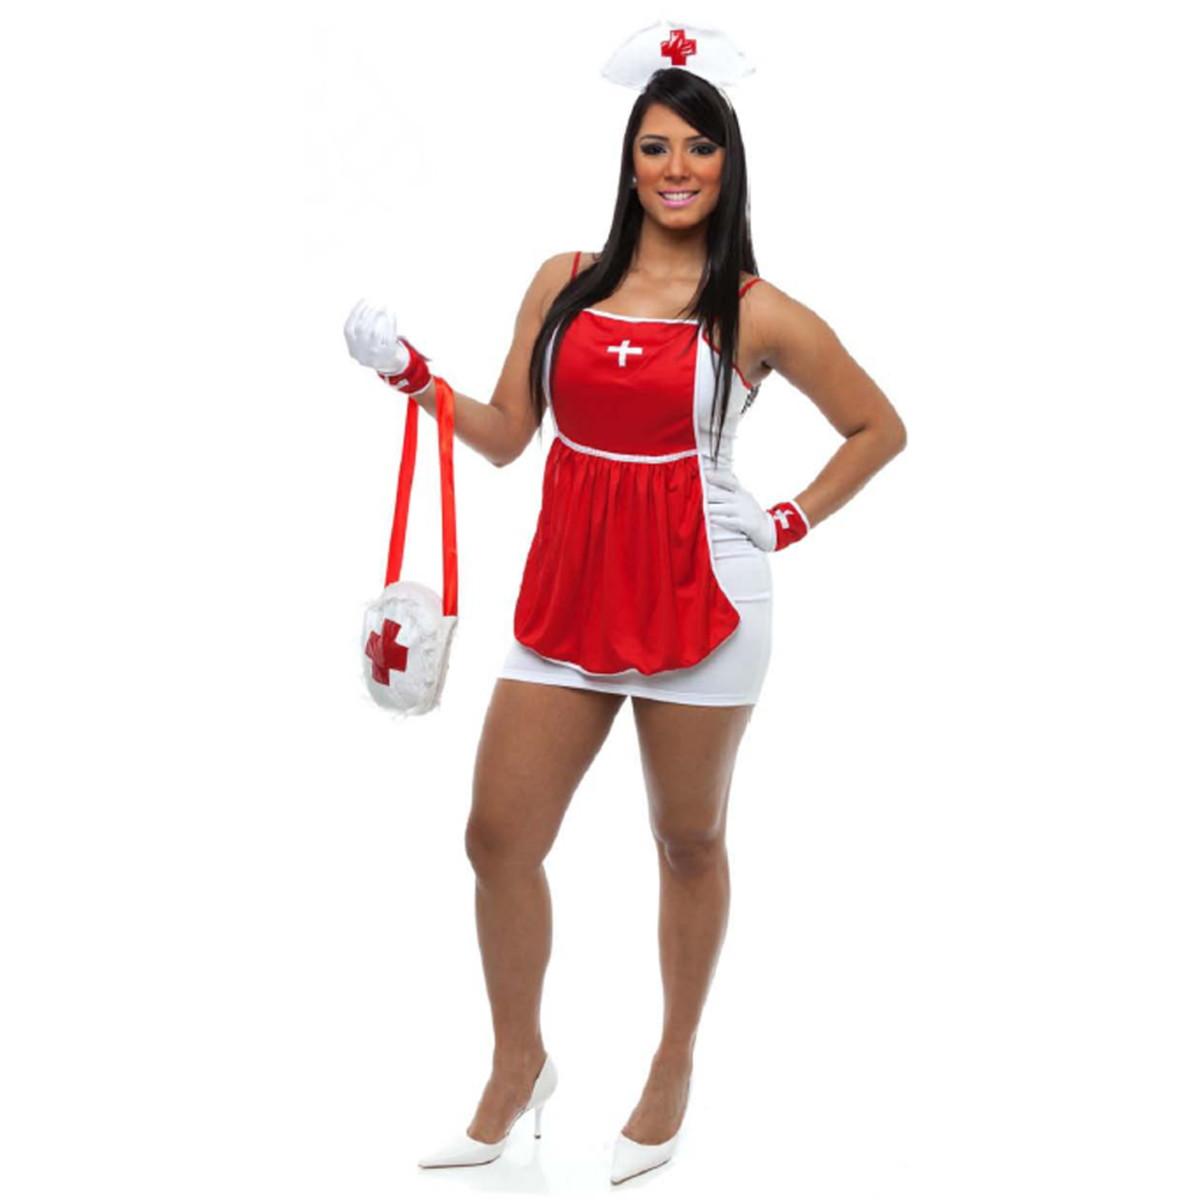 09b29023c Fantasia Enfermeira Sexy Feminina Carnaval Médica no Elo7 ...